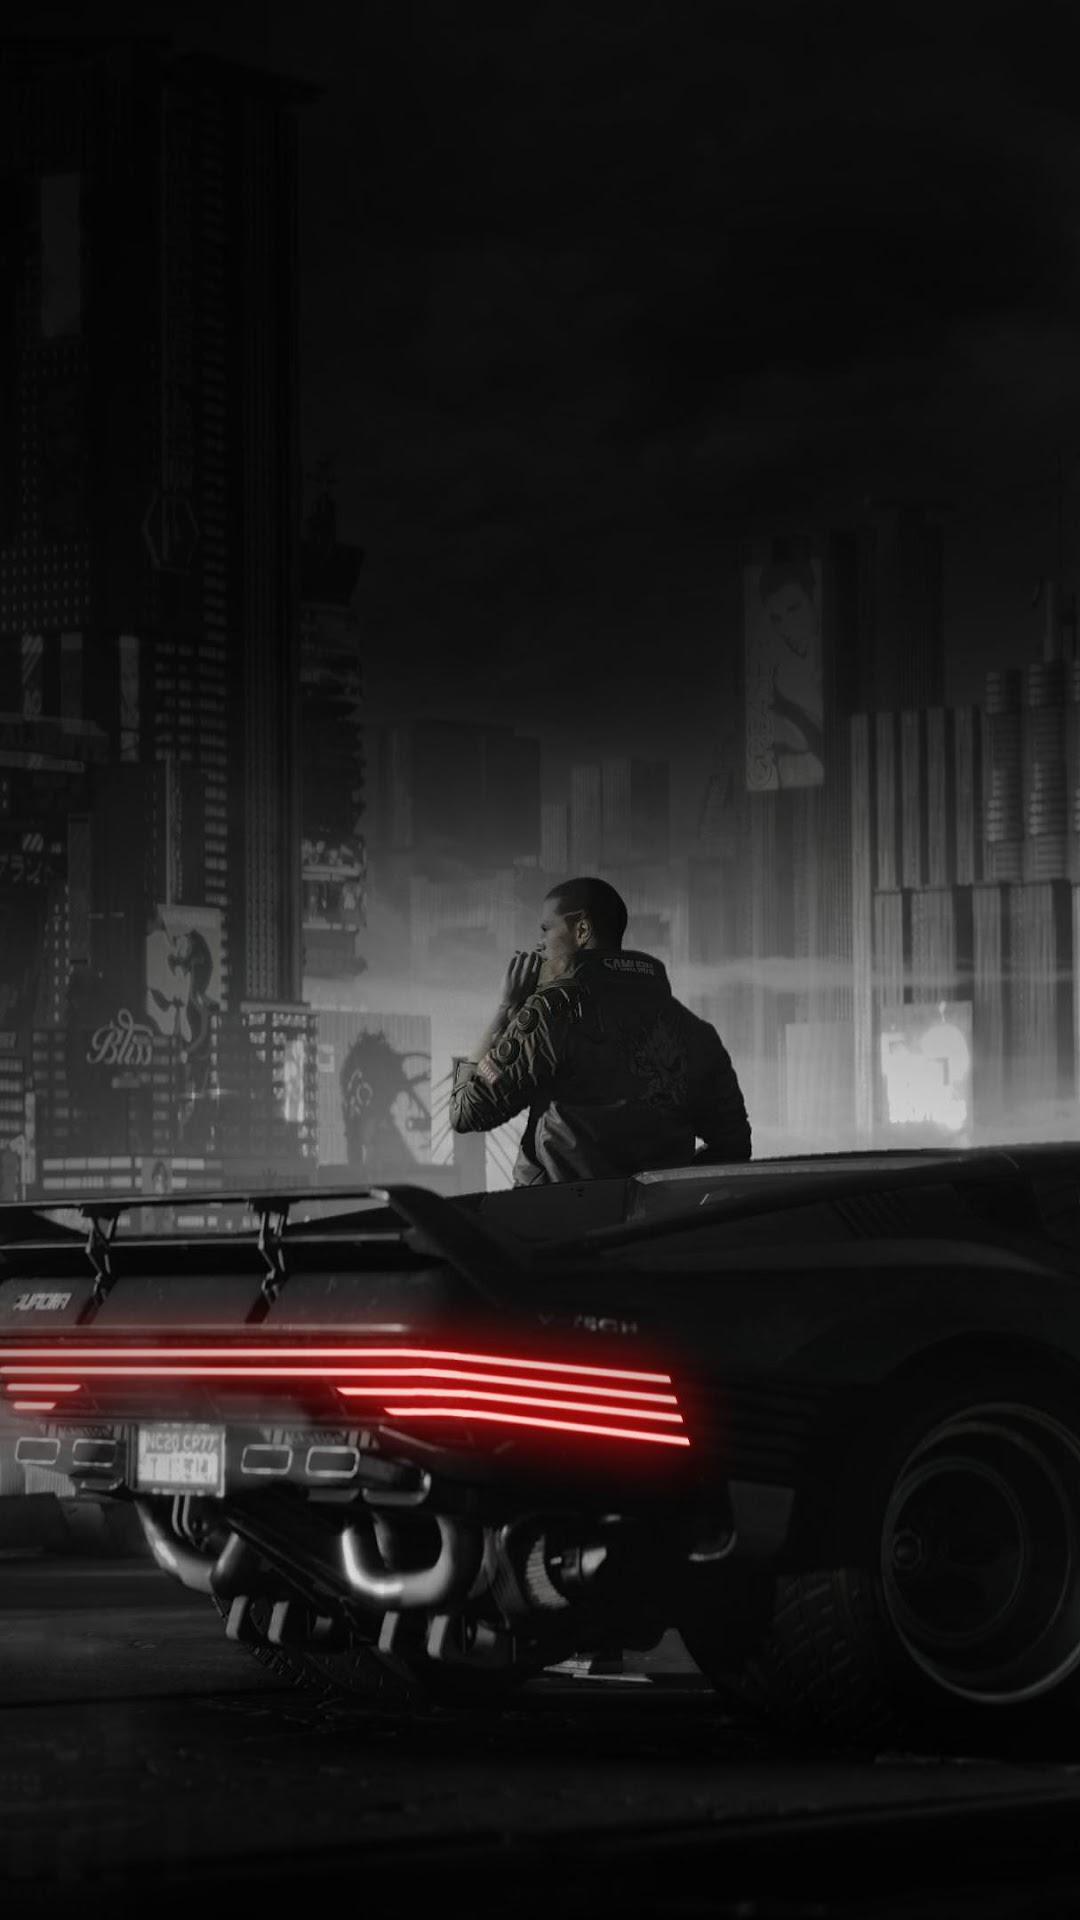 Cyberpunk 2077 V Car Quadra V Tech 4k Wallpaper 92